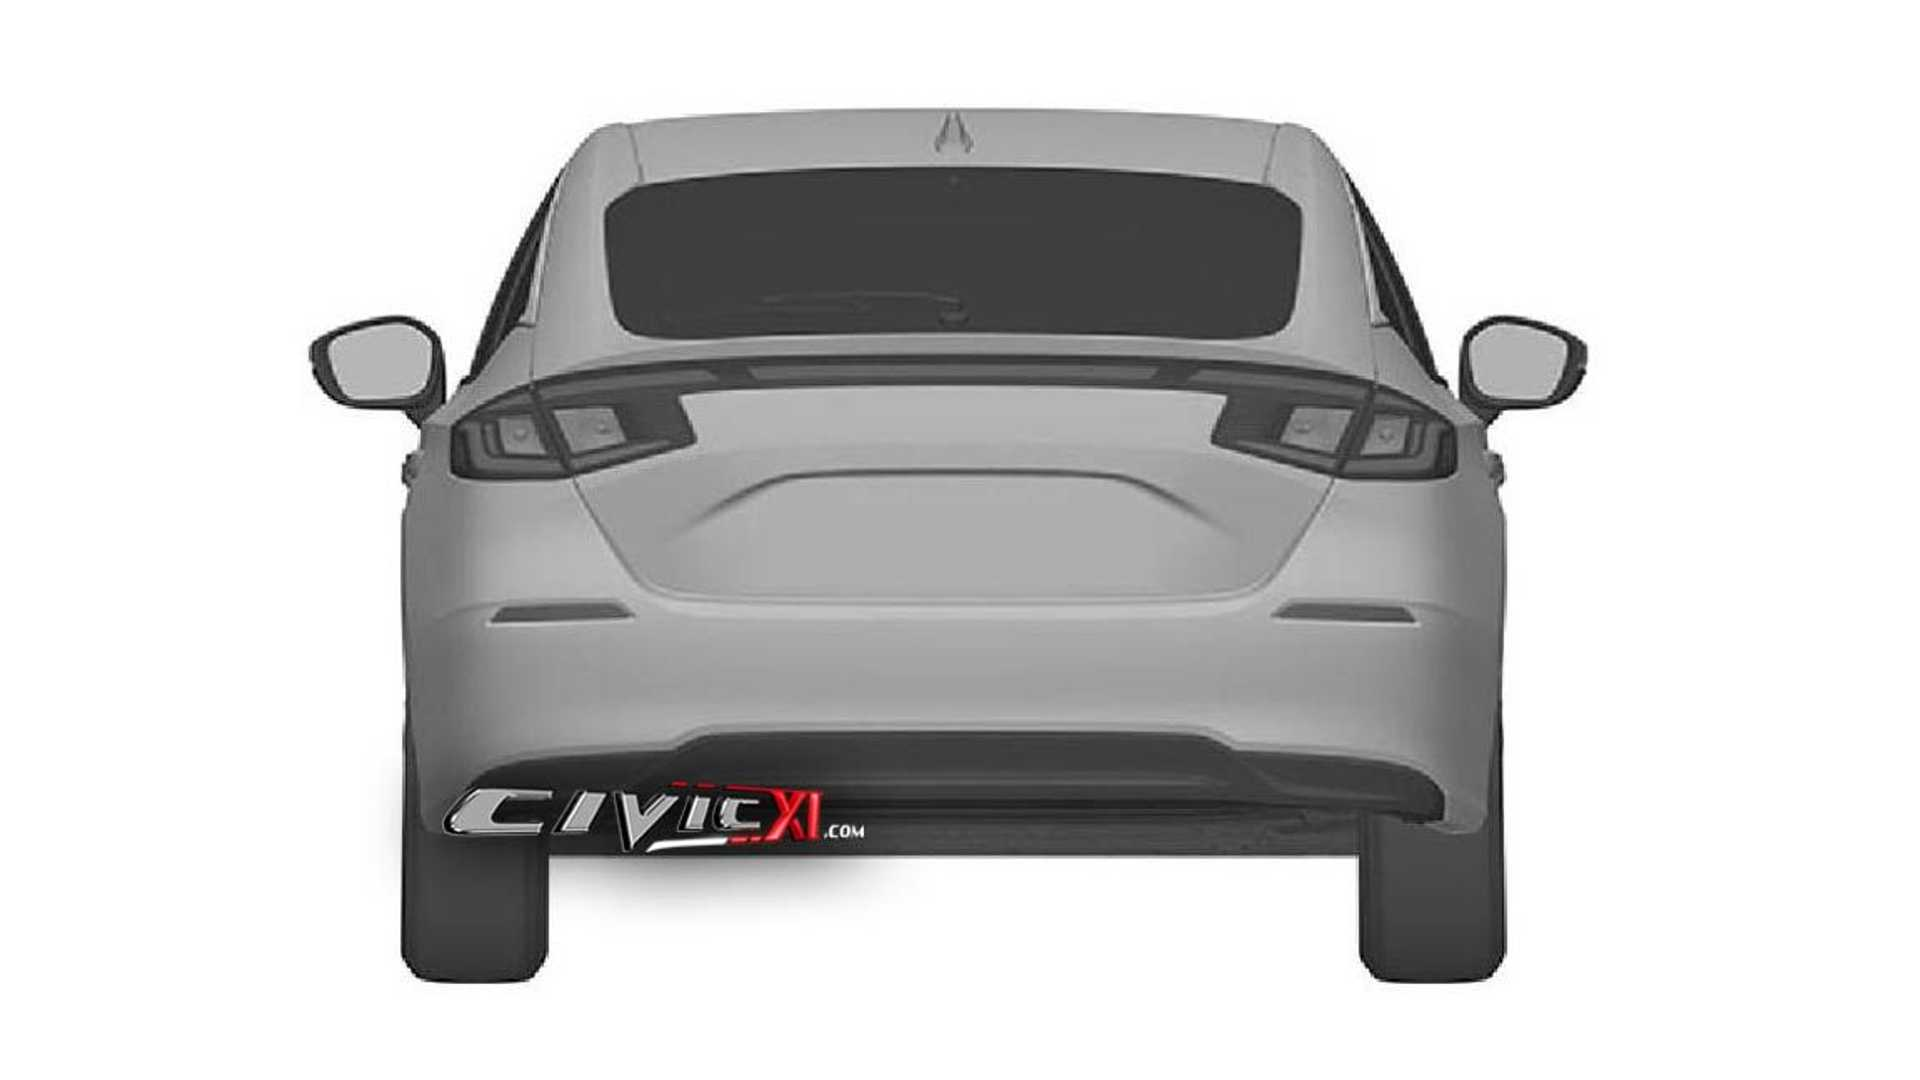 honda-civic-11th-generation-design-trademark-back